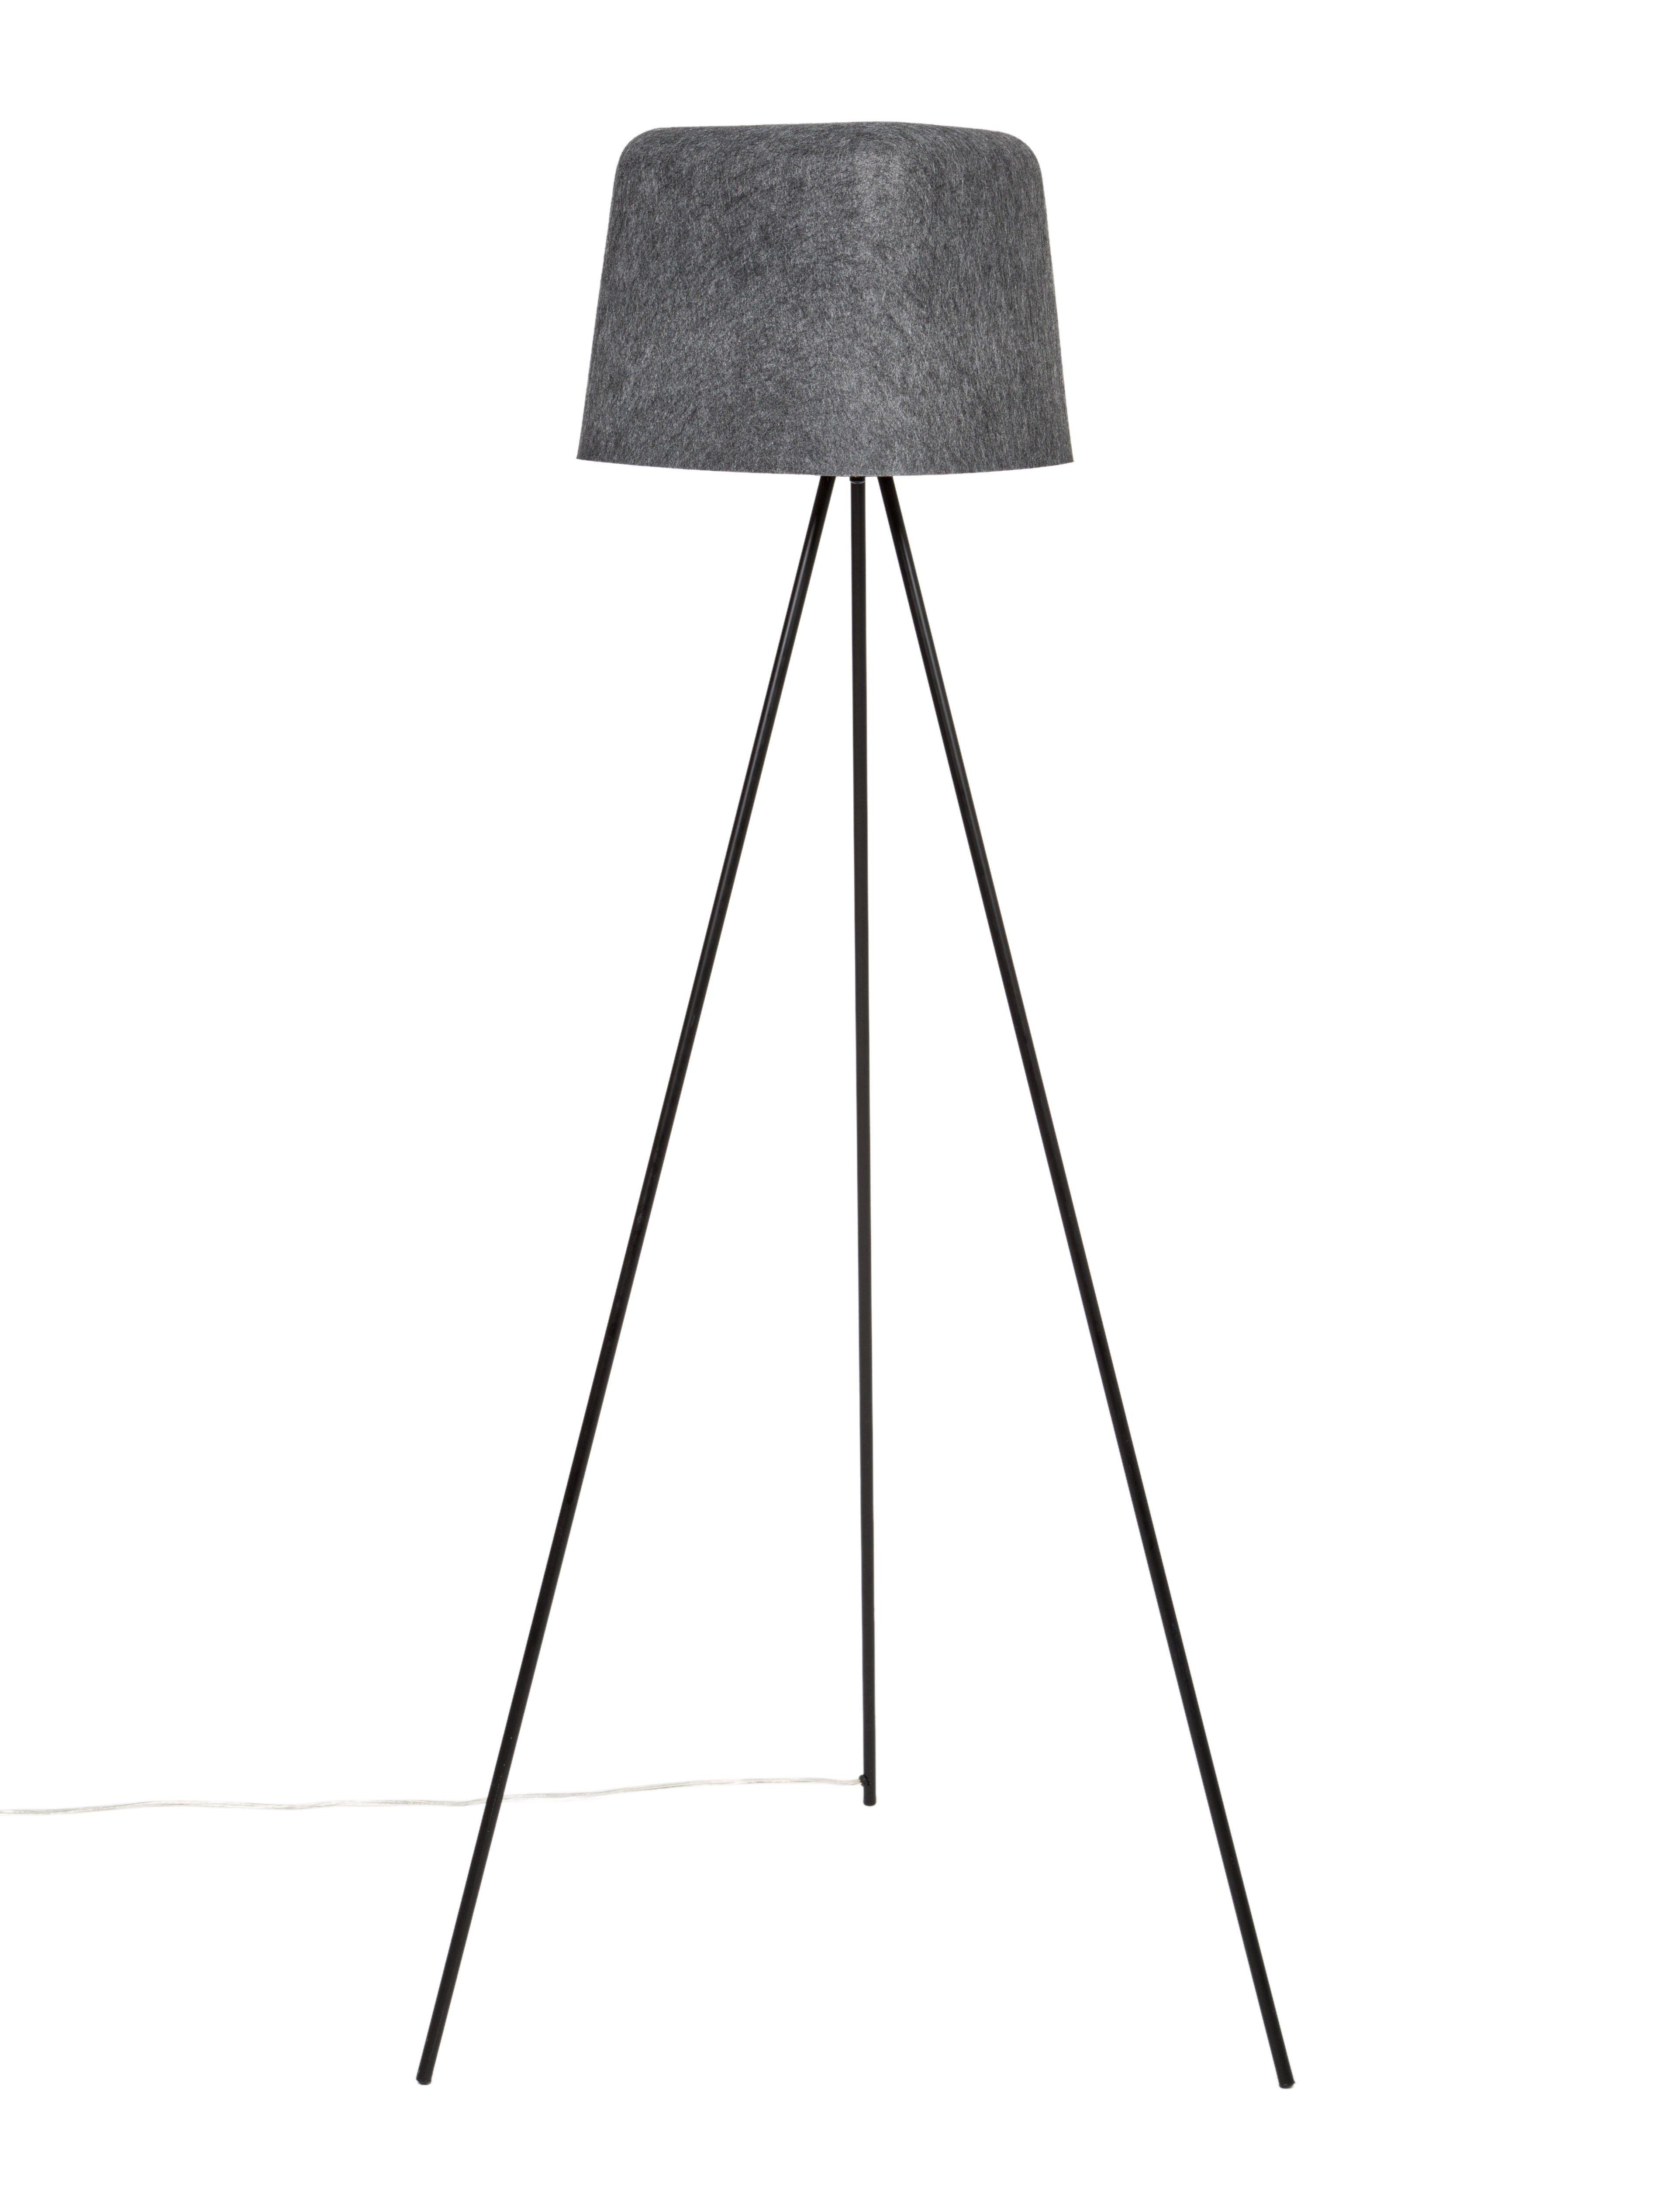 Felt Floor Lamp Floor Lamp Lamp House Styles